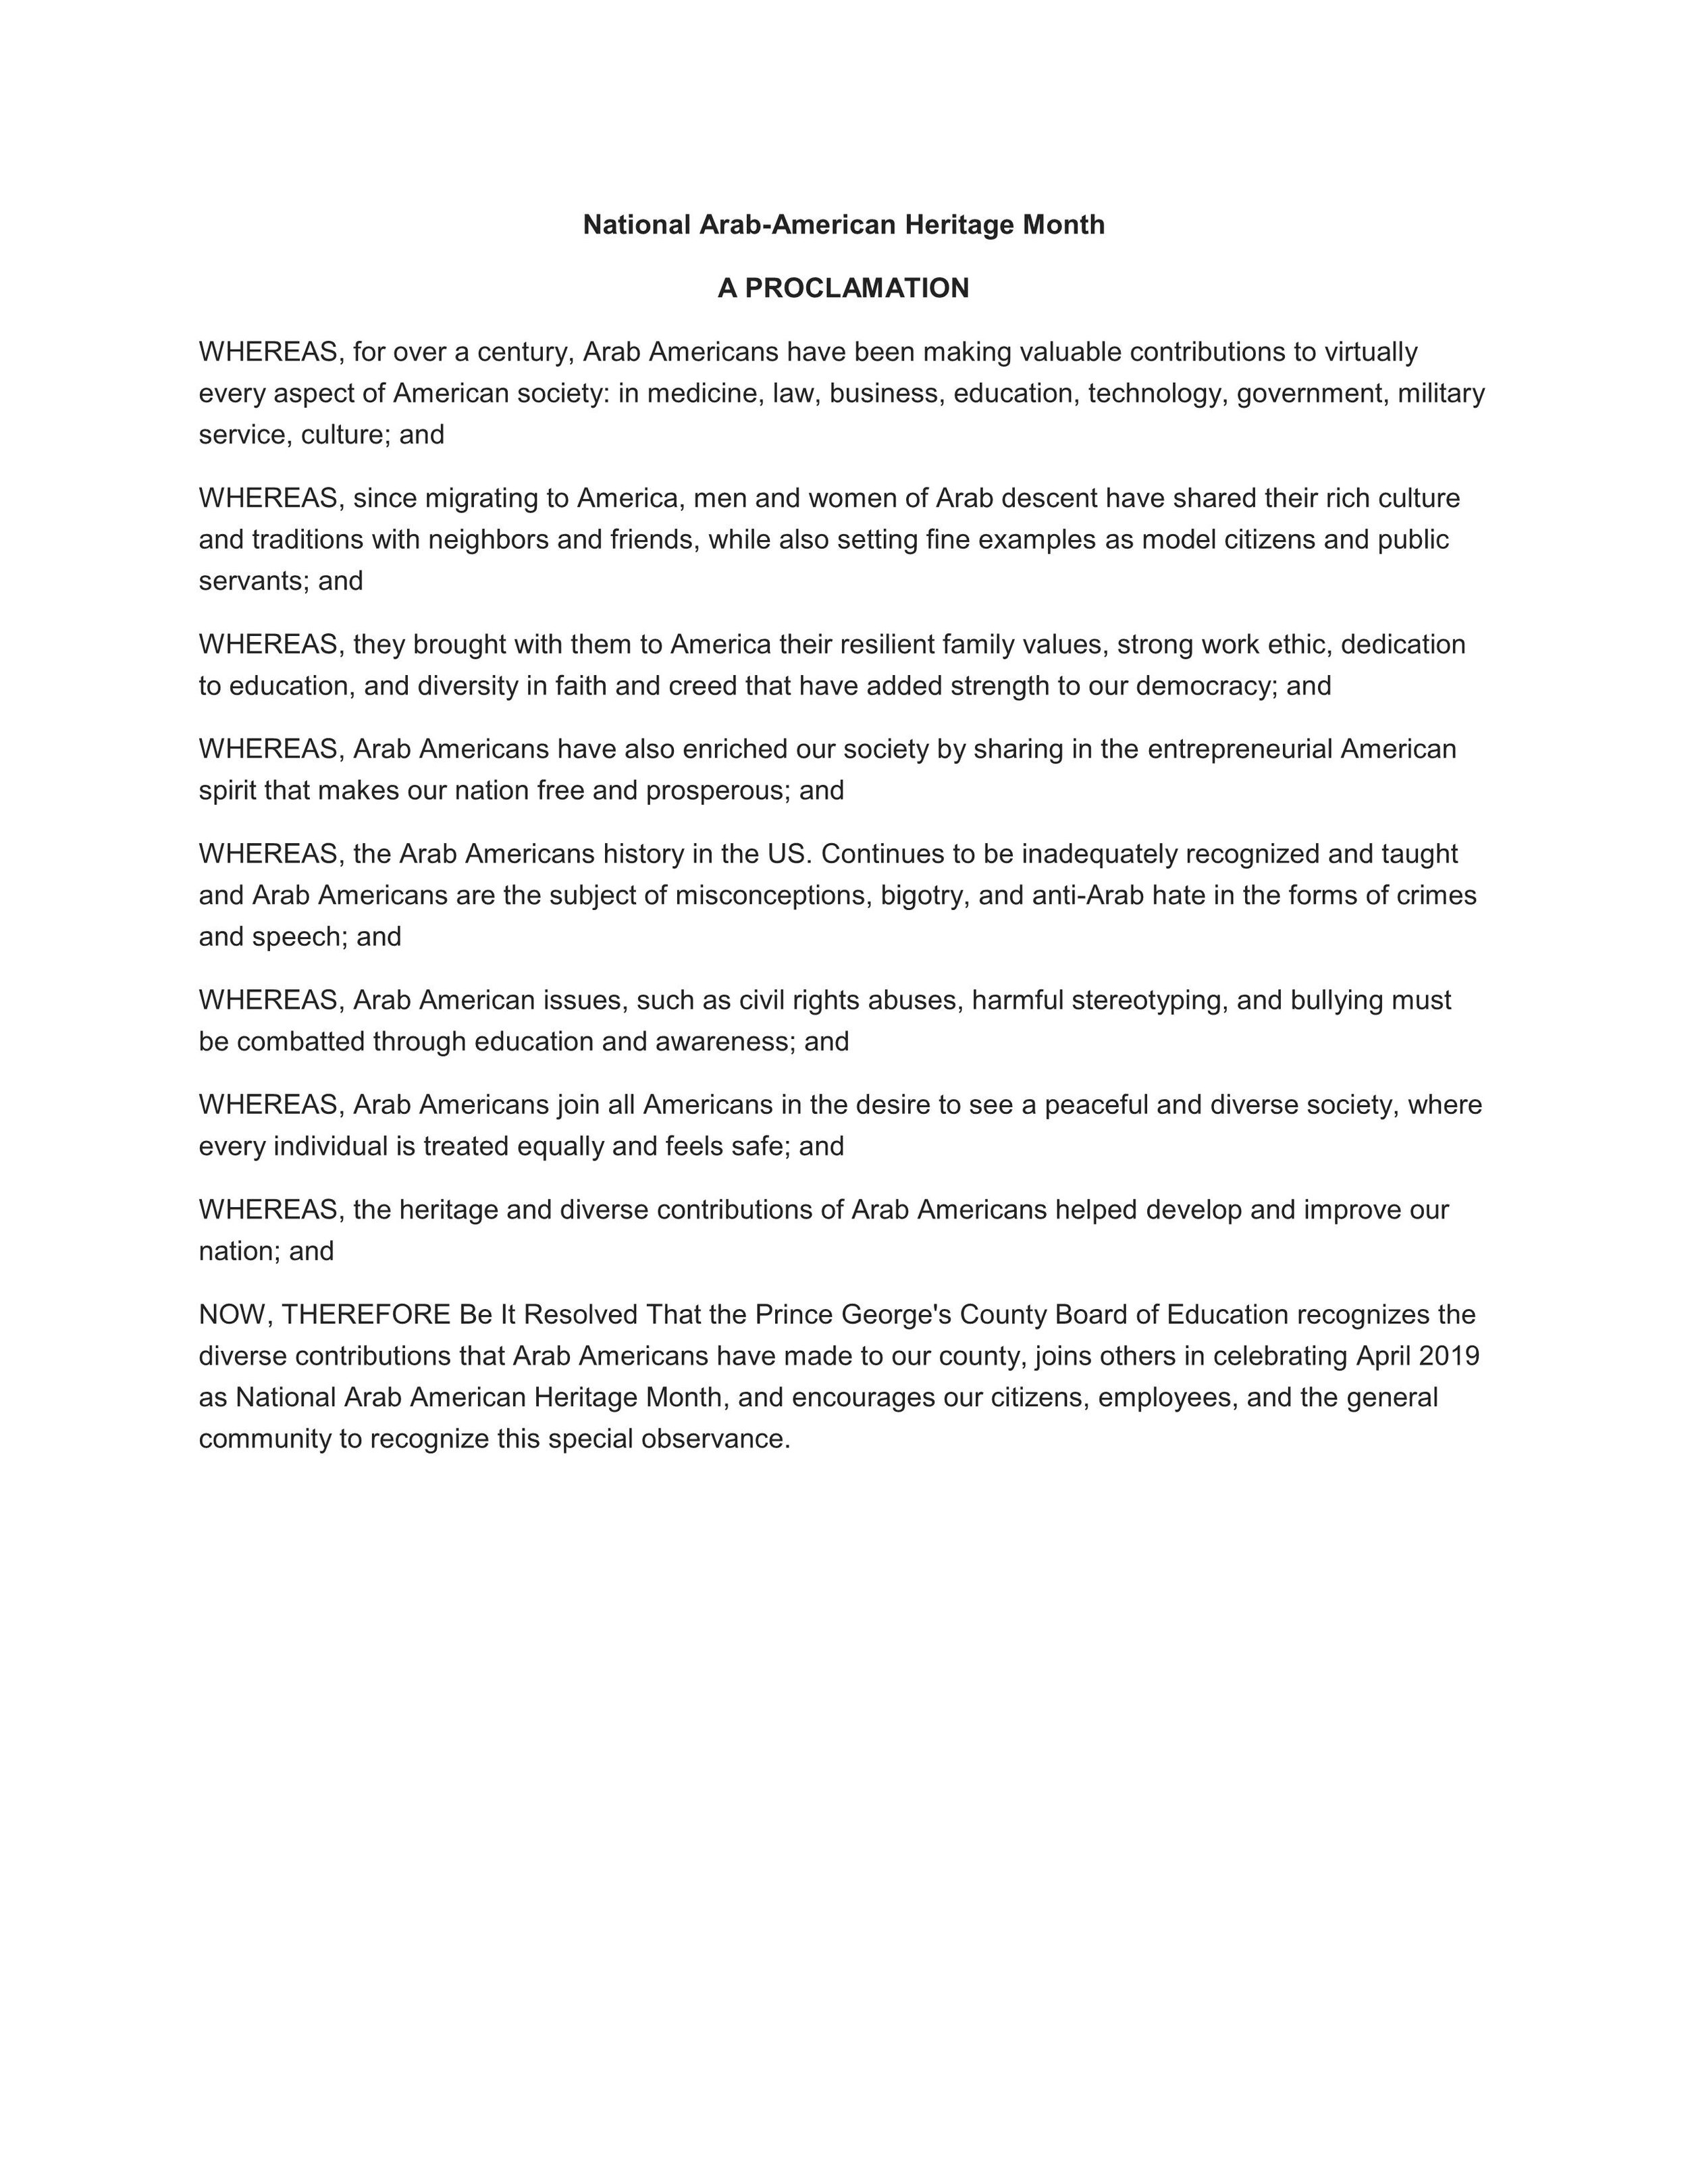 PG-Board of Education- Proclamation (2)_1.jpg